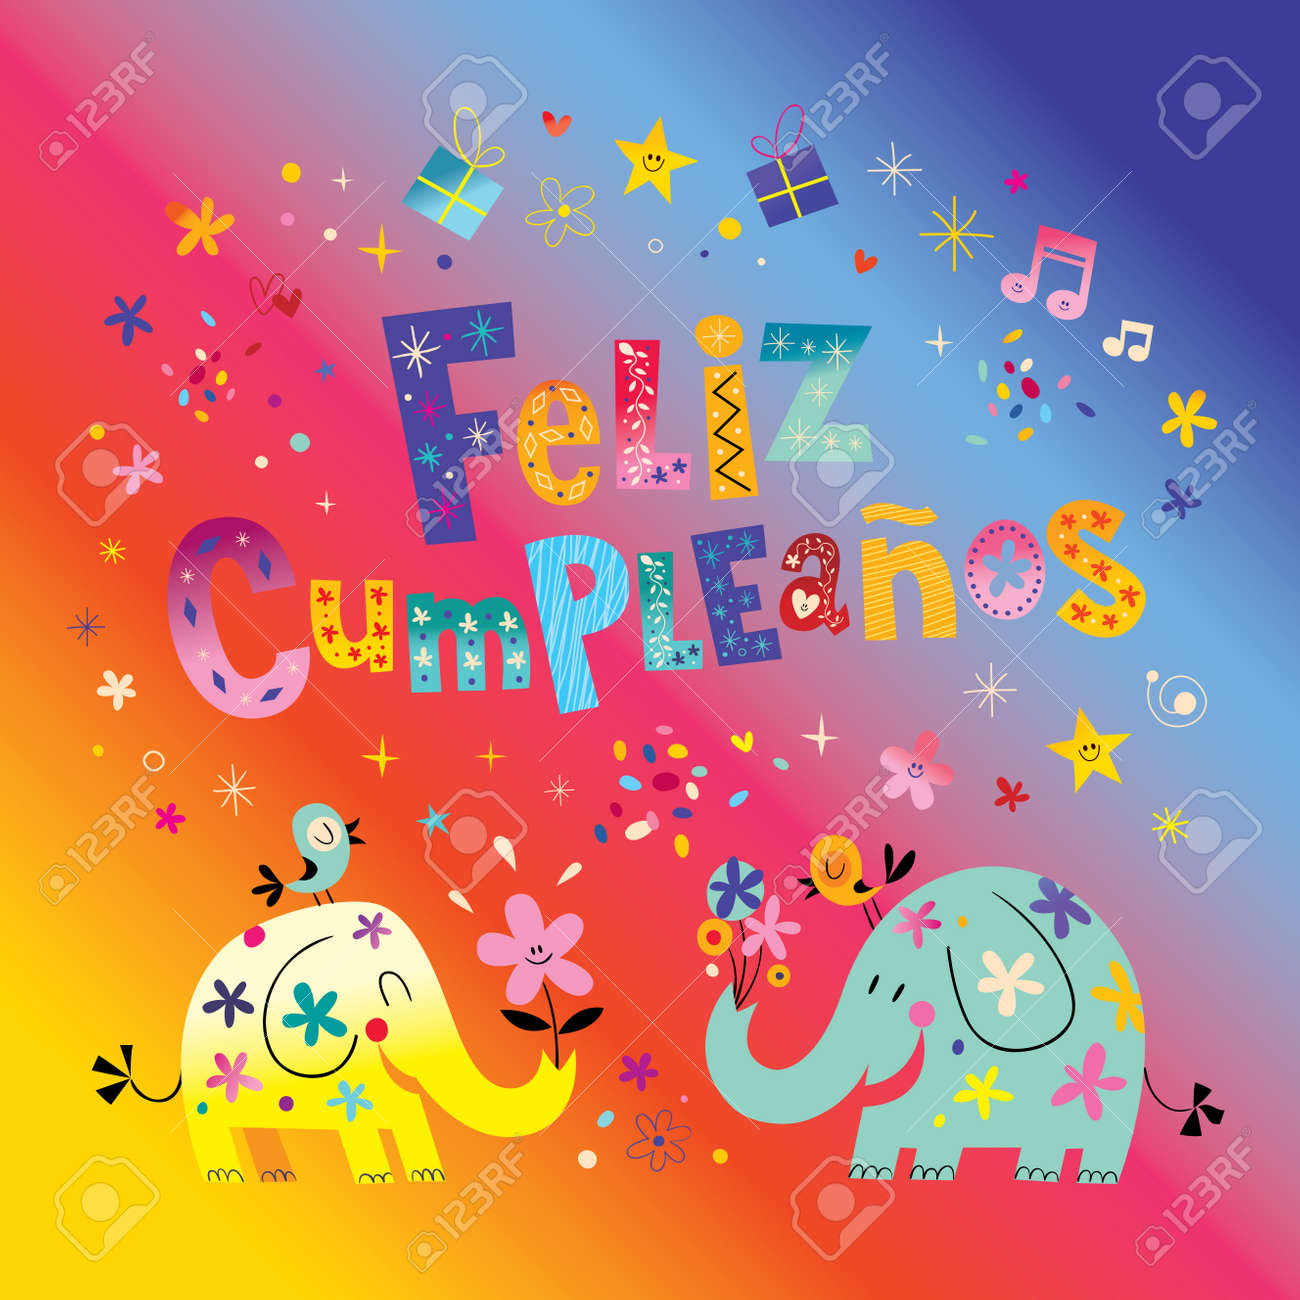 Feliz Cumpleanos Happy Birthday In Spanish Greeting Card With